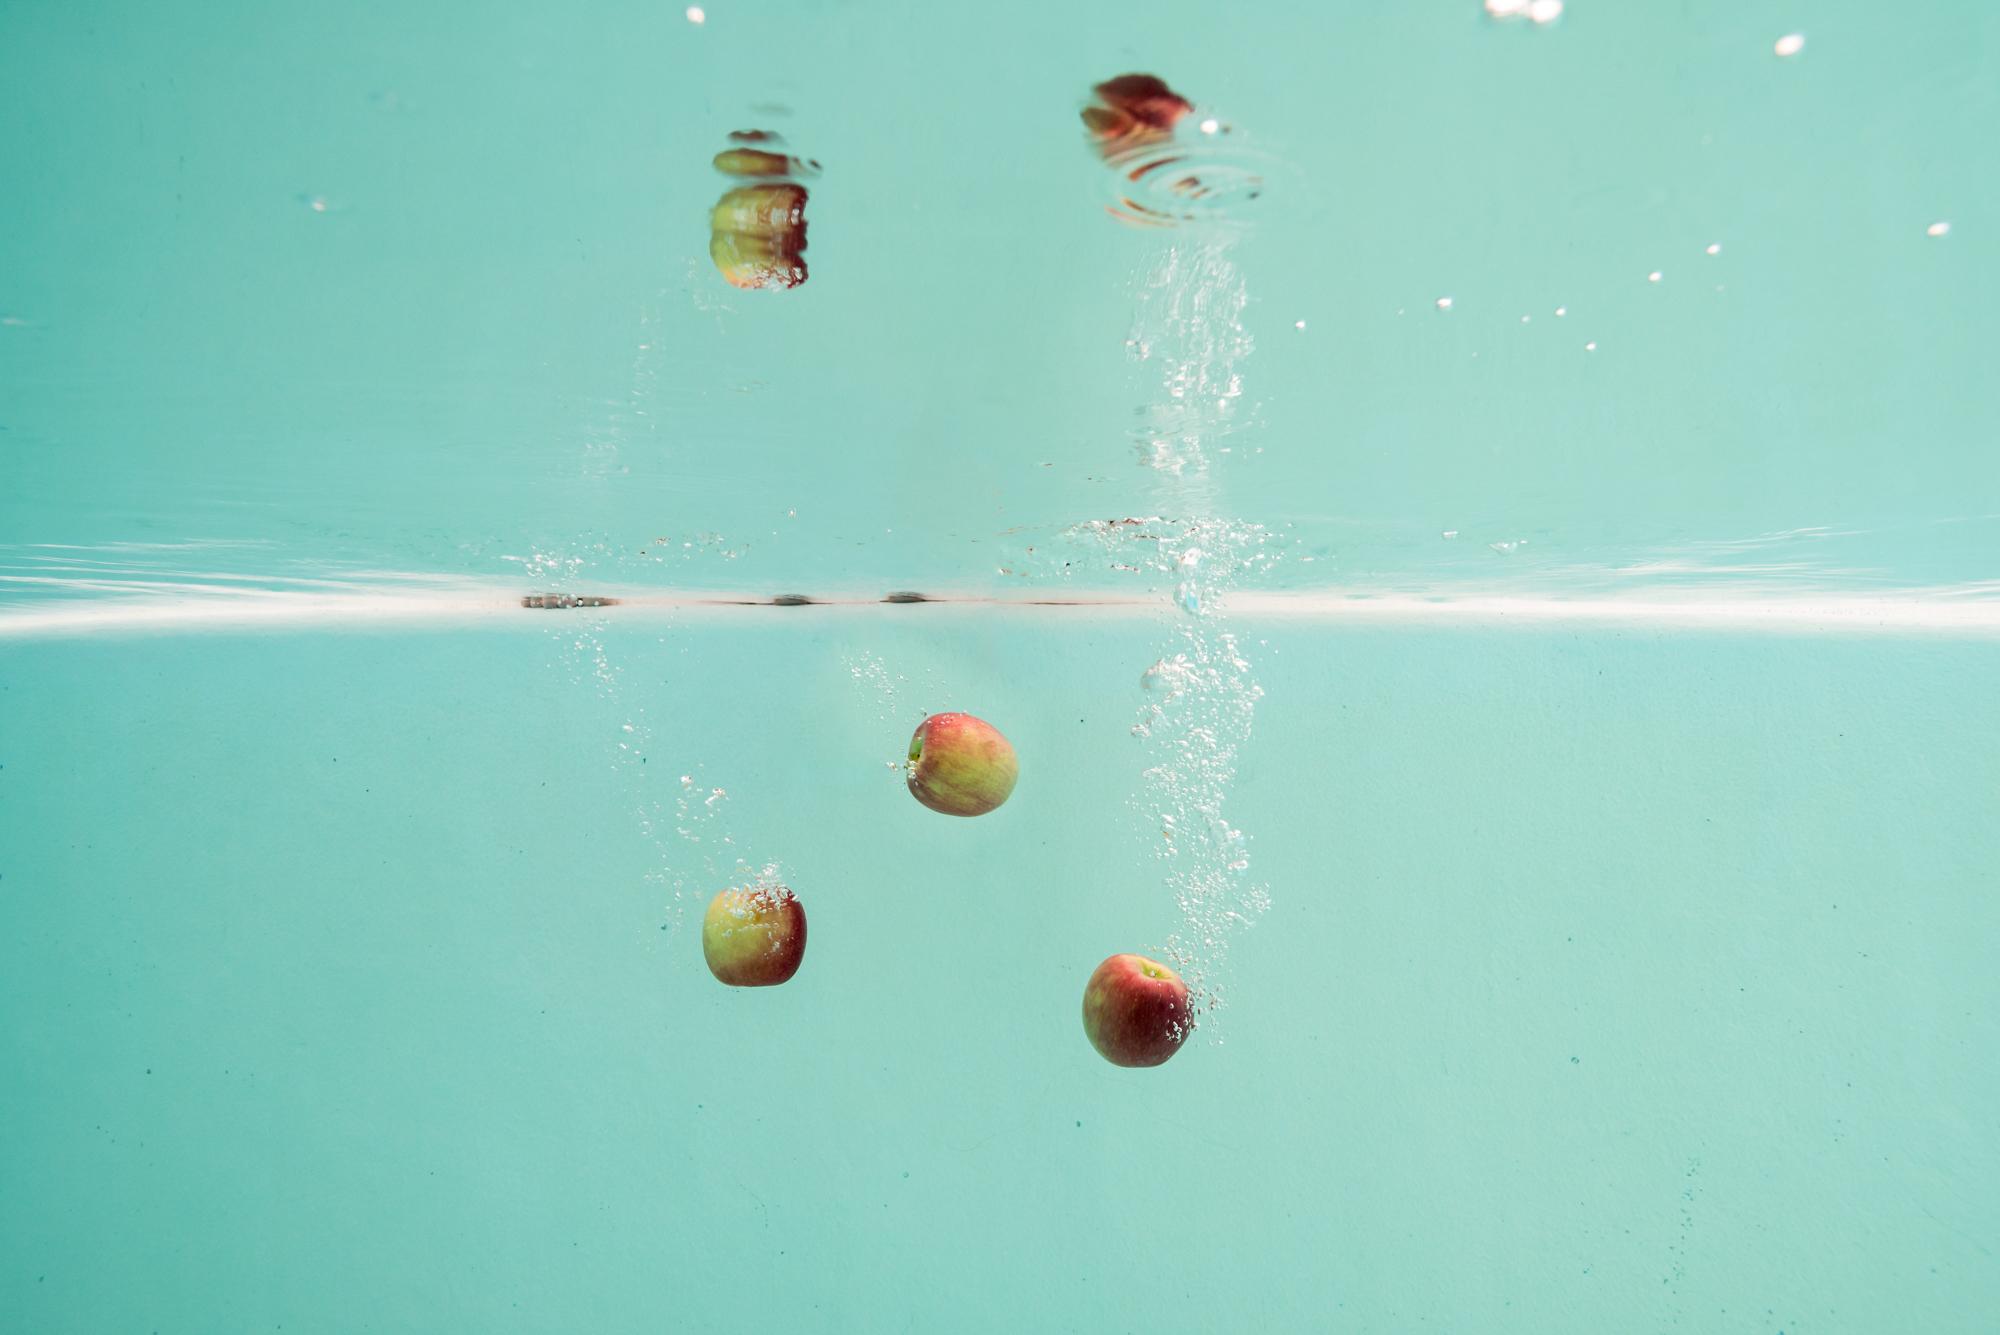 Séance-photo-aquatique-Underwater Photographer-Nathalie Butera Photographie